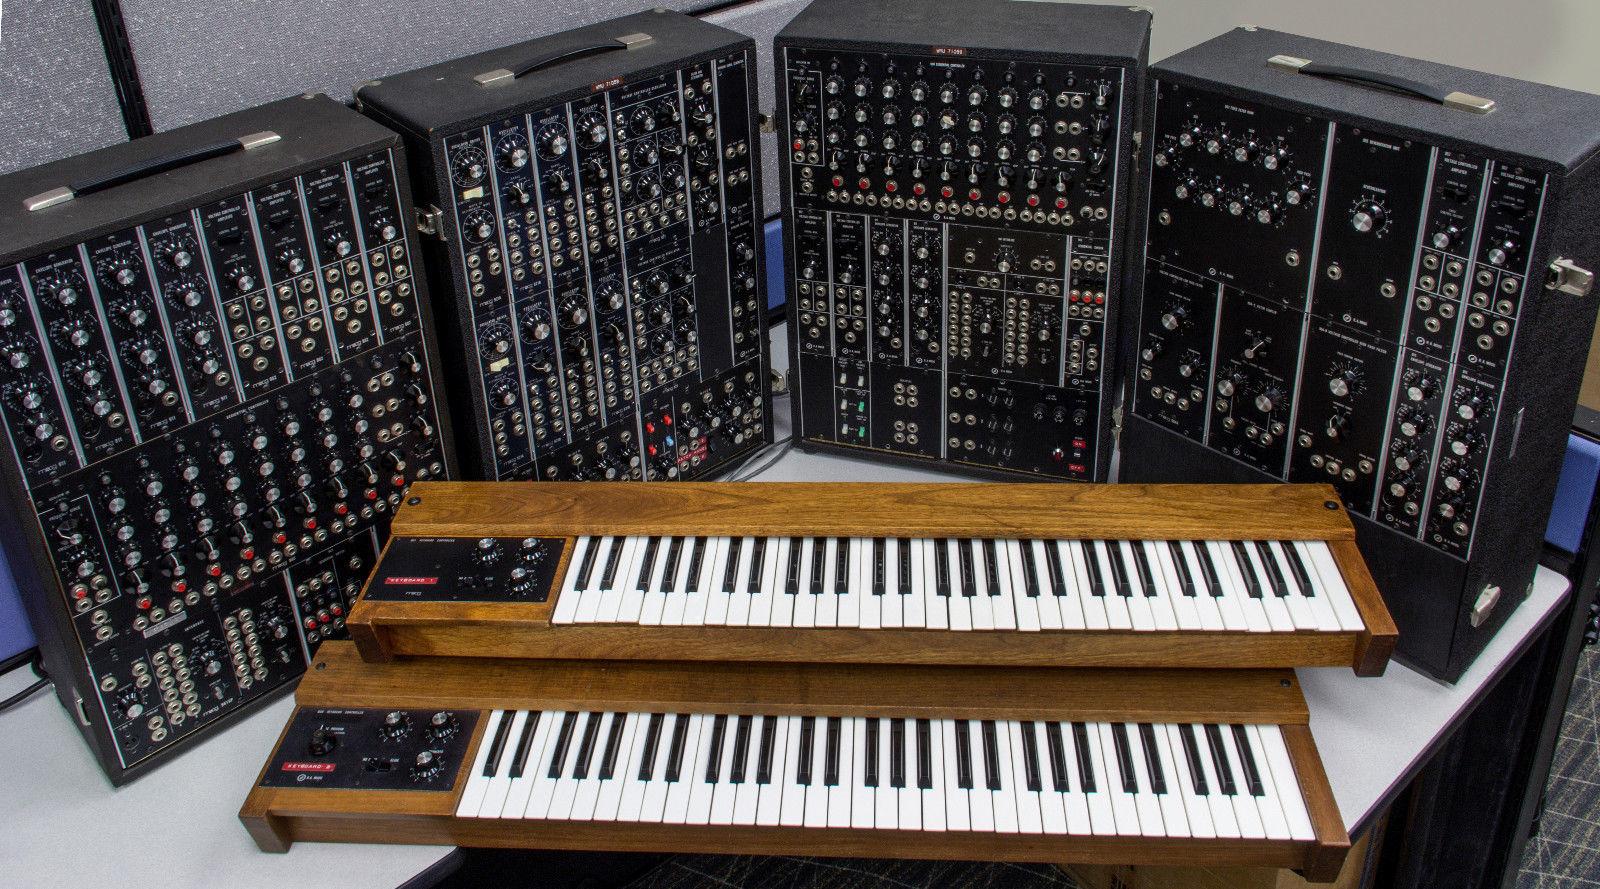 matrixsynth vintage 1968 1980s moog modular synthesizer 4 suit case system w 2 keyboards for. Black Bedroom Furniture Sets. Home Design Ideas